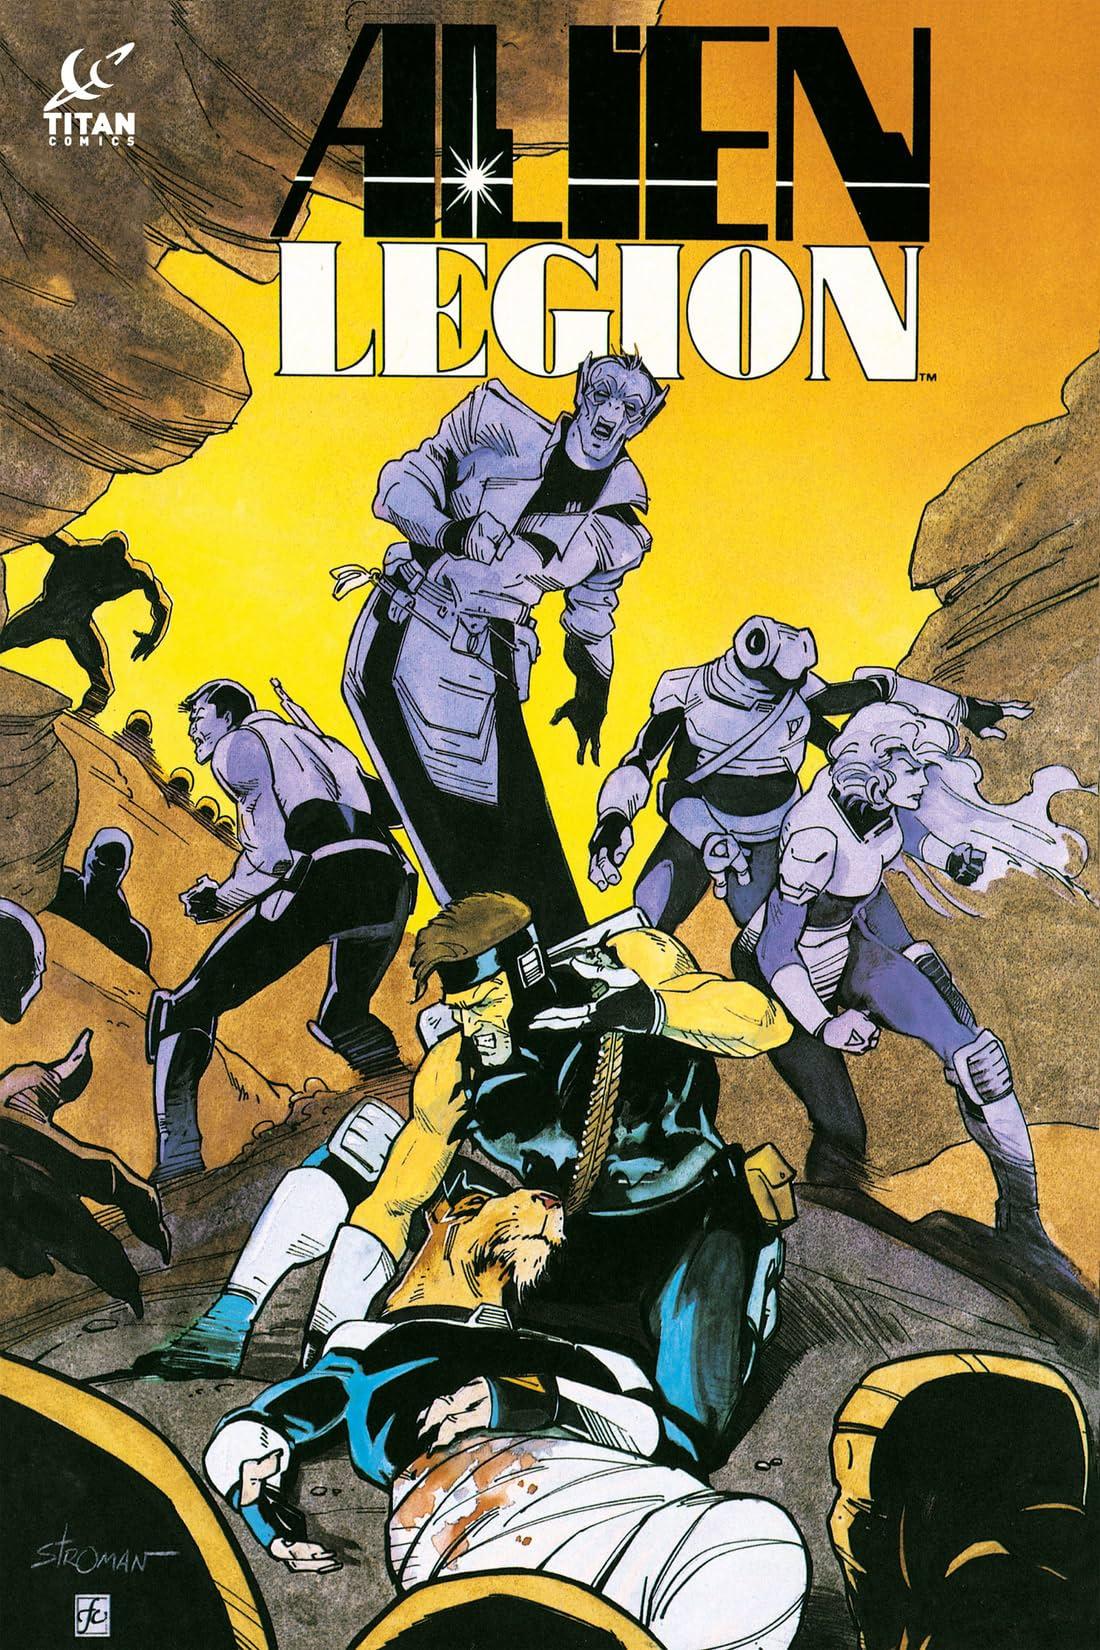 Alien Legion #23